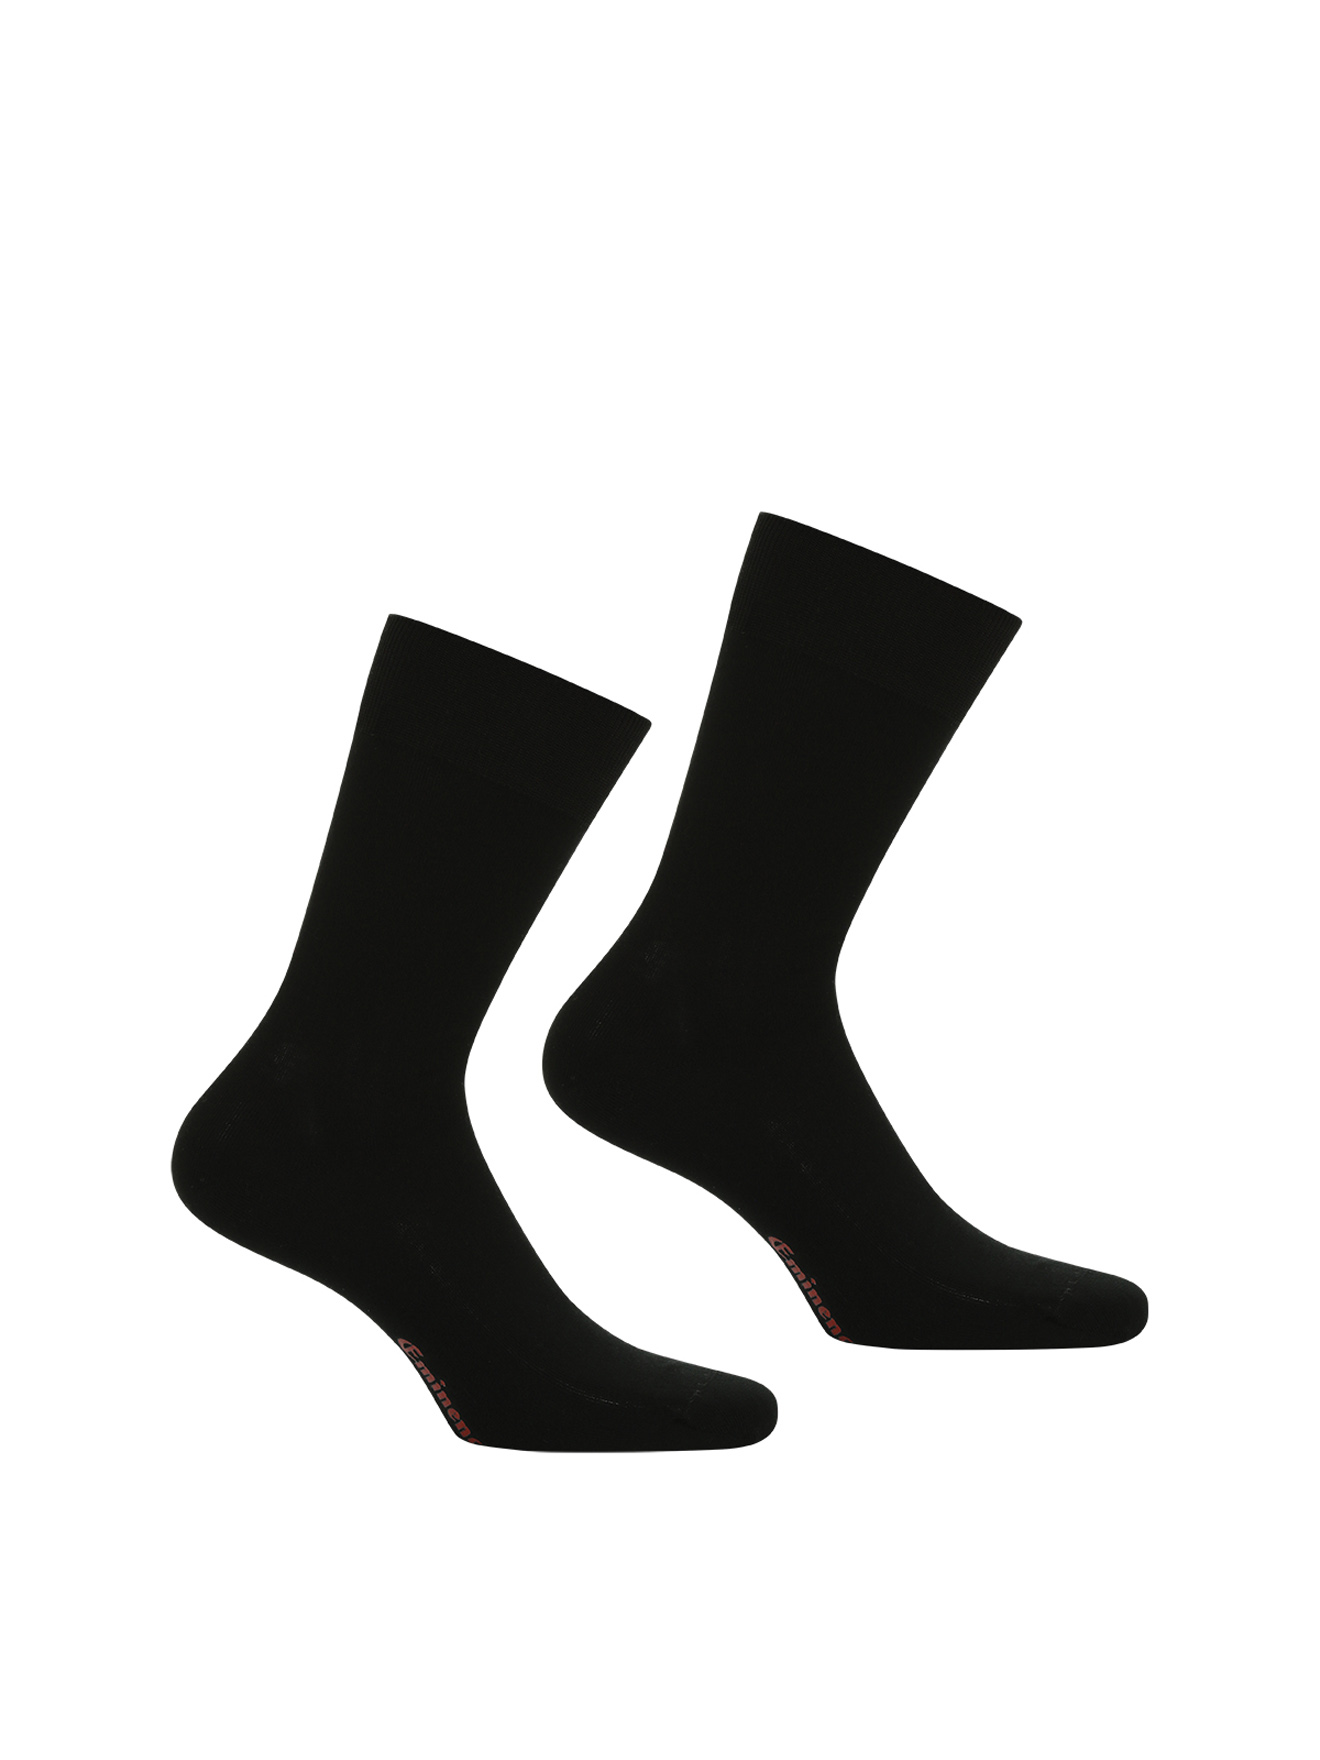 pares escoceses 2 de calcetines Daxon 3A5RjL4